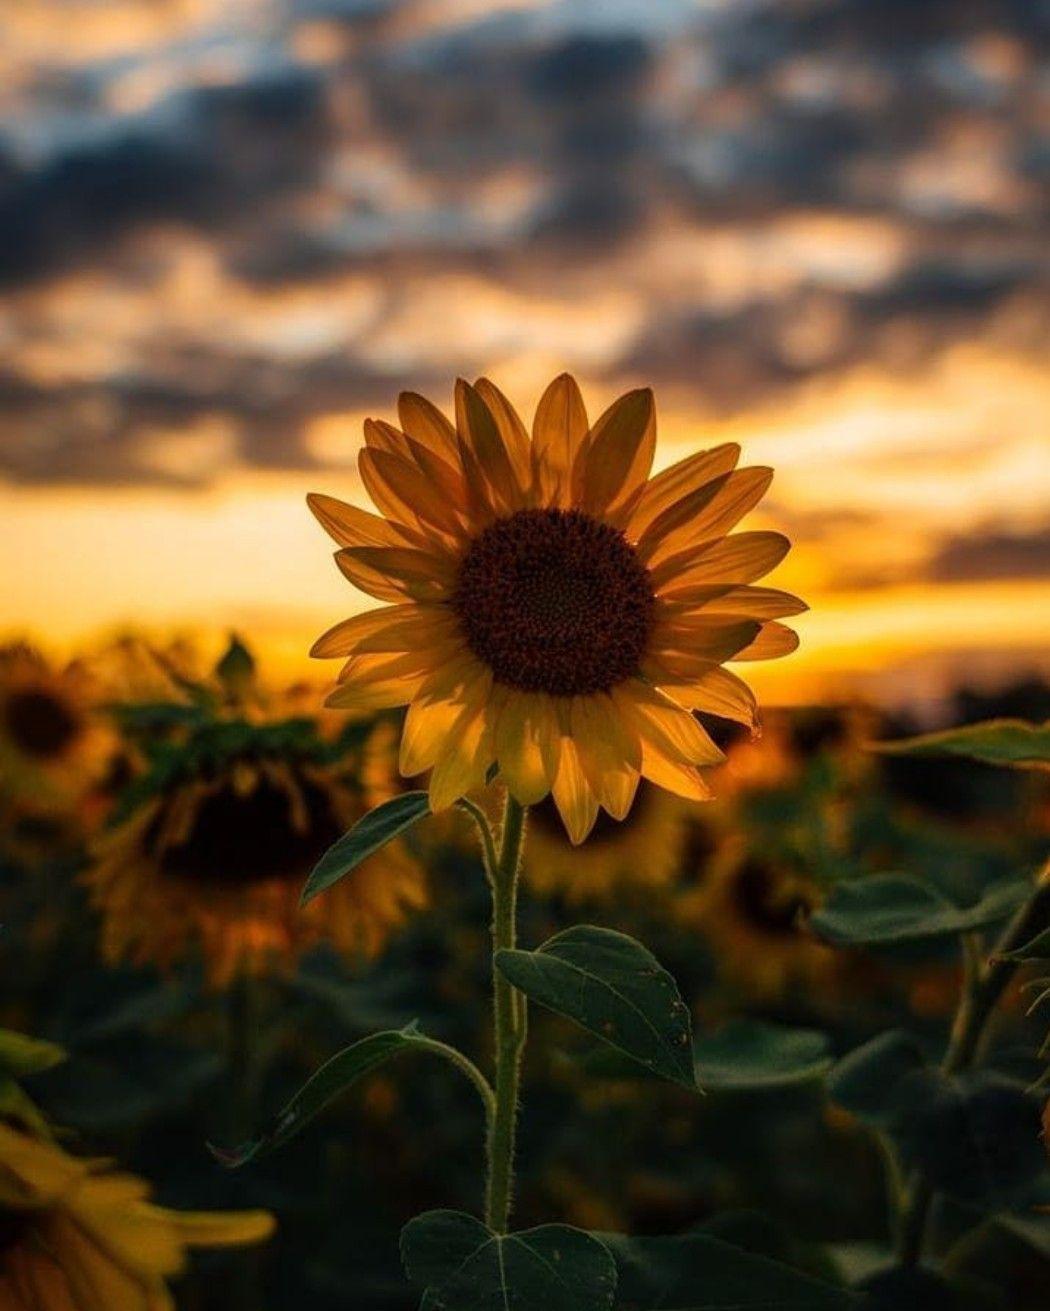 Wallpaper Iphone Wallpaper Sunflower Pictures